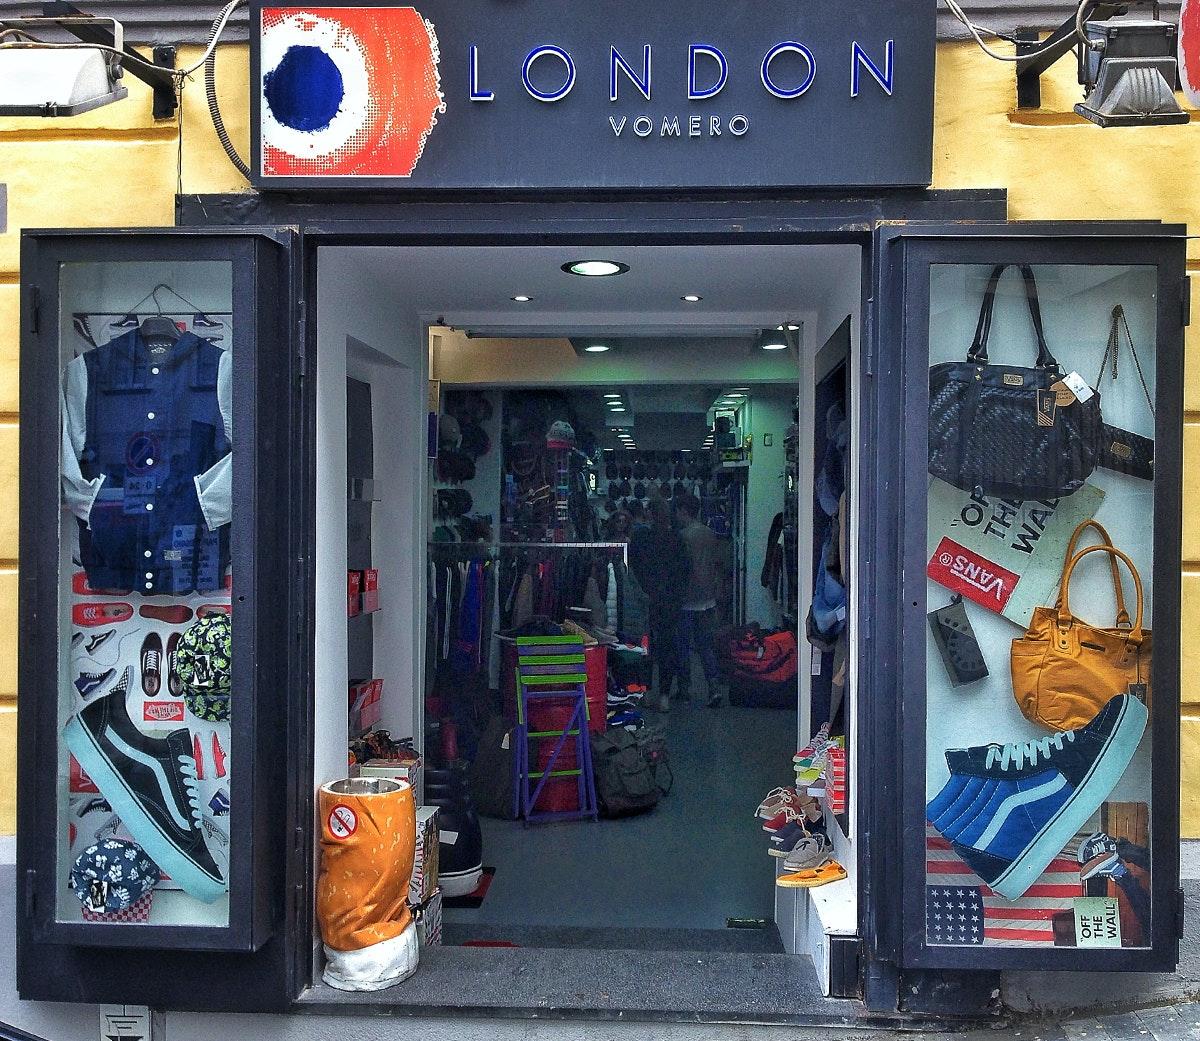 London Vomero